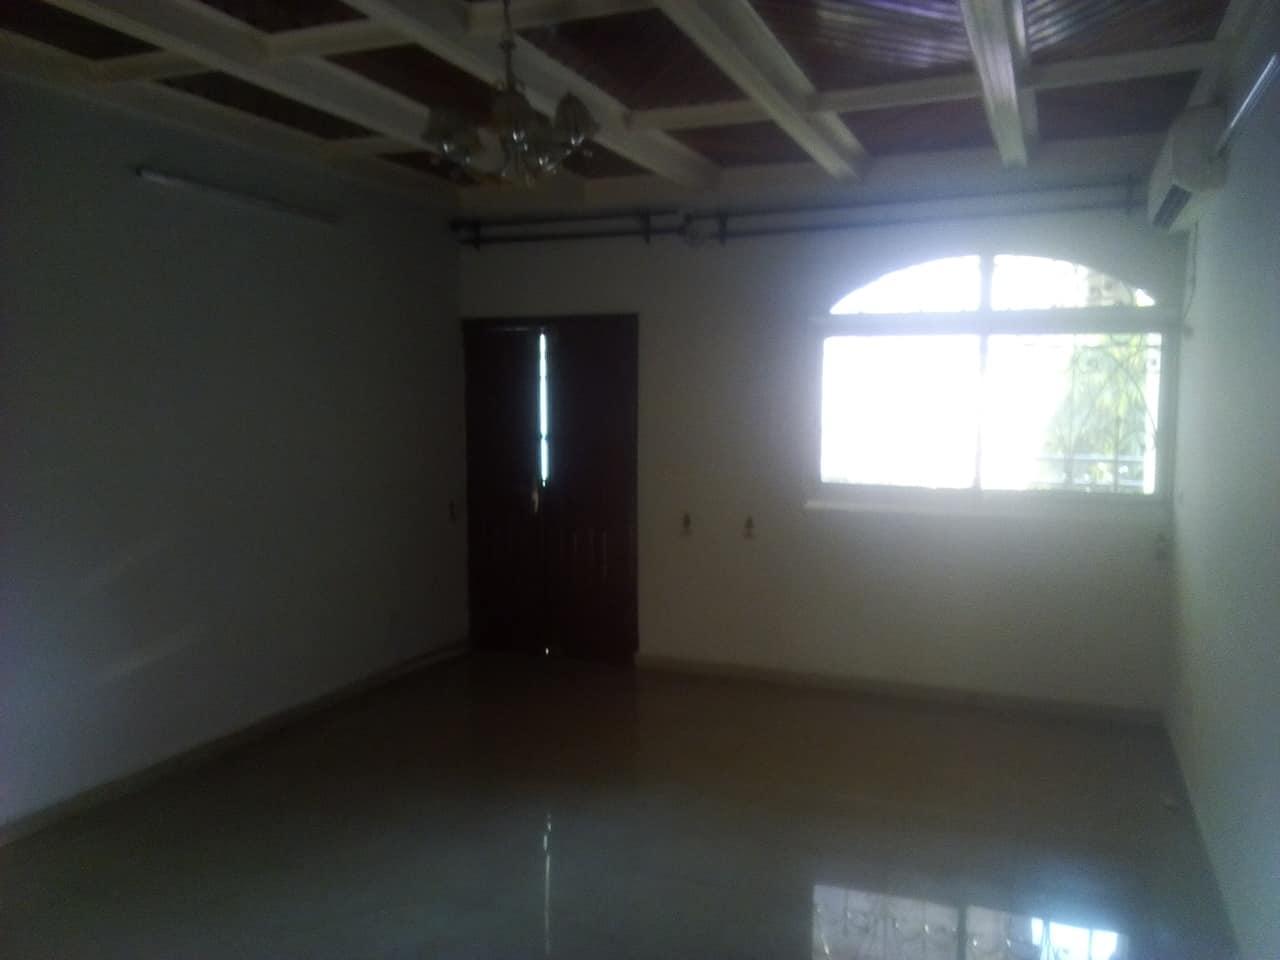 Apartment to rent - Yaoundé, Mfandena, avenue foe - 1 living room(s), 2 bedroom(s), 2 bathroom(s) - 300 000 FCFA / month